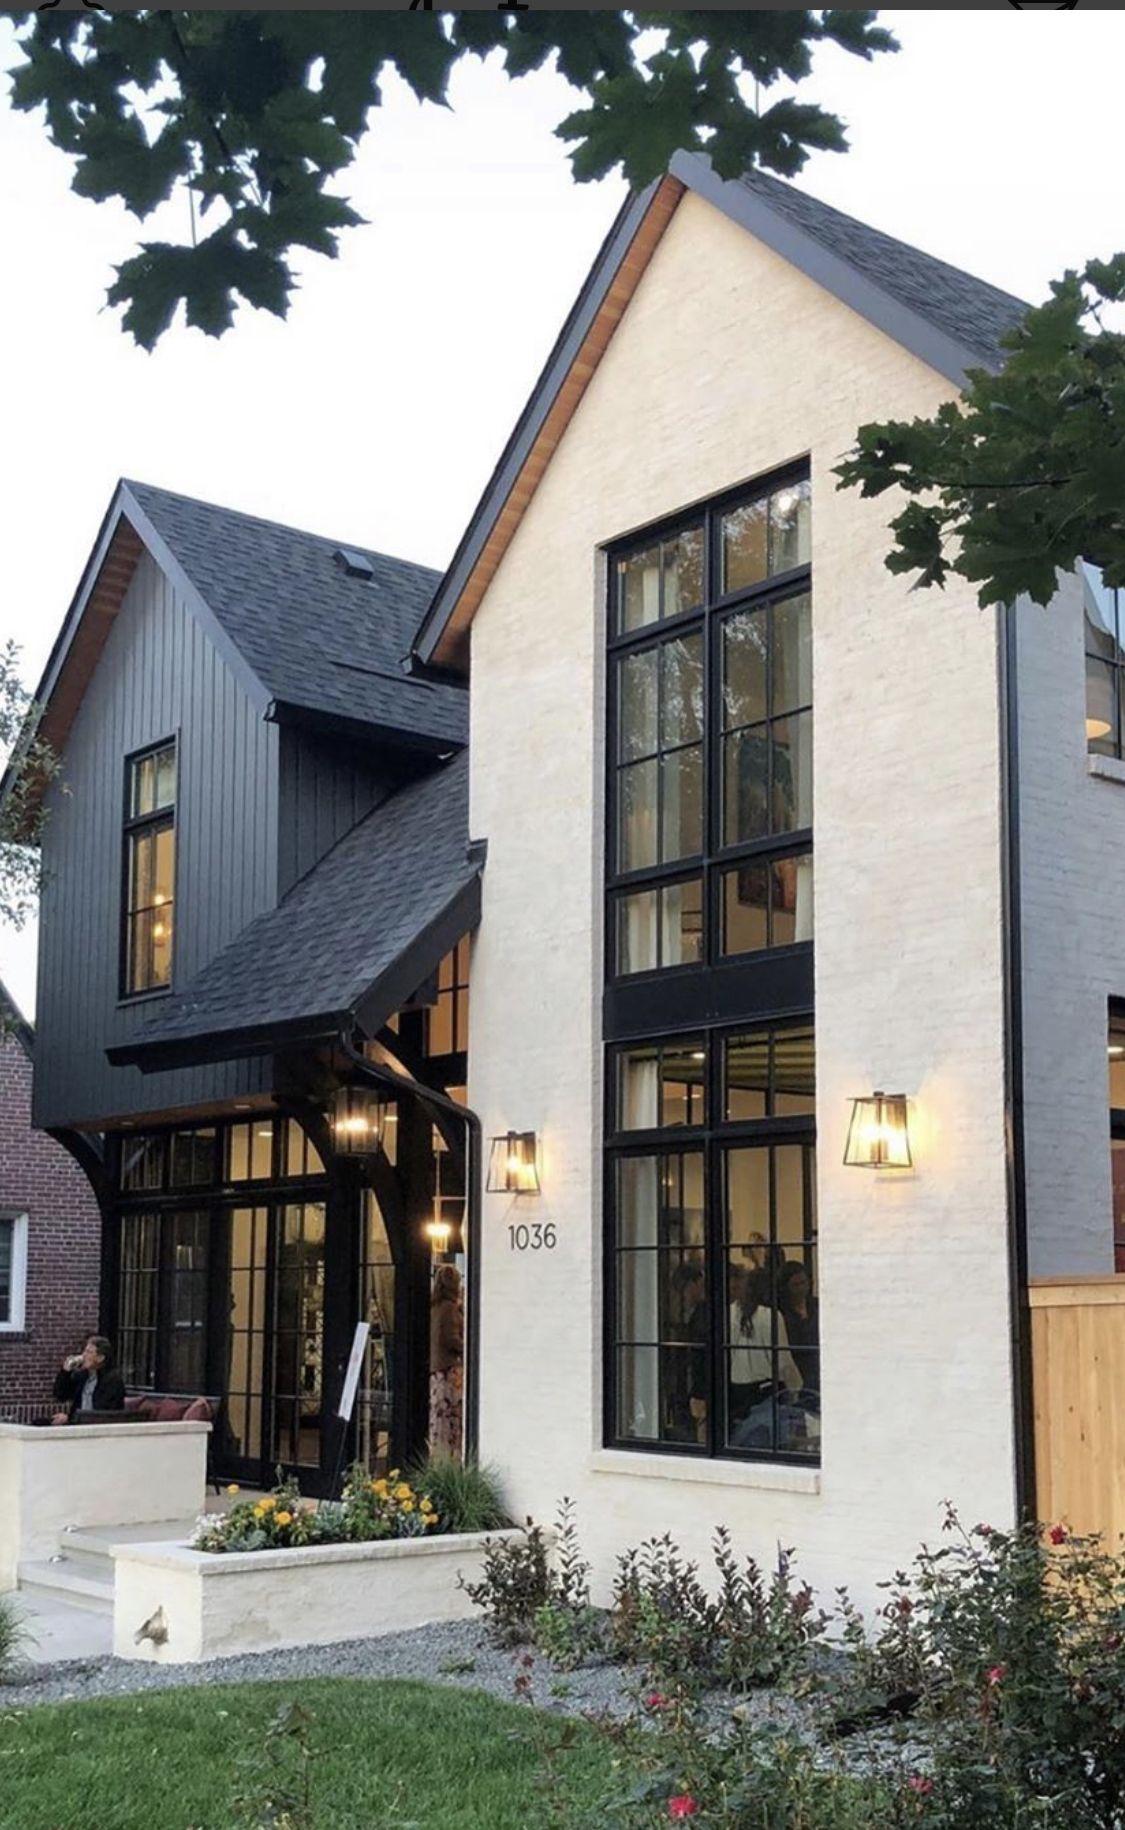 Pin By Anja Boye Kristensen On Housing Ideas Exterior Design Dream House Exterior Modern Farmhouse Exterior House Exterior